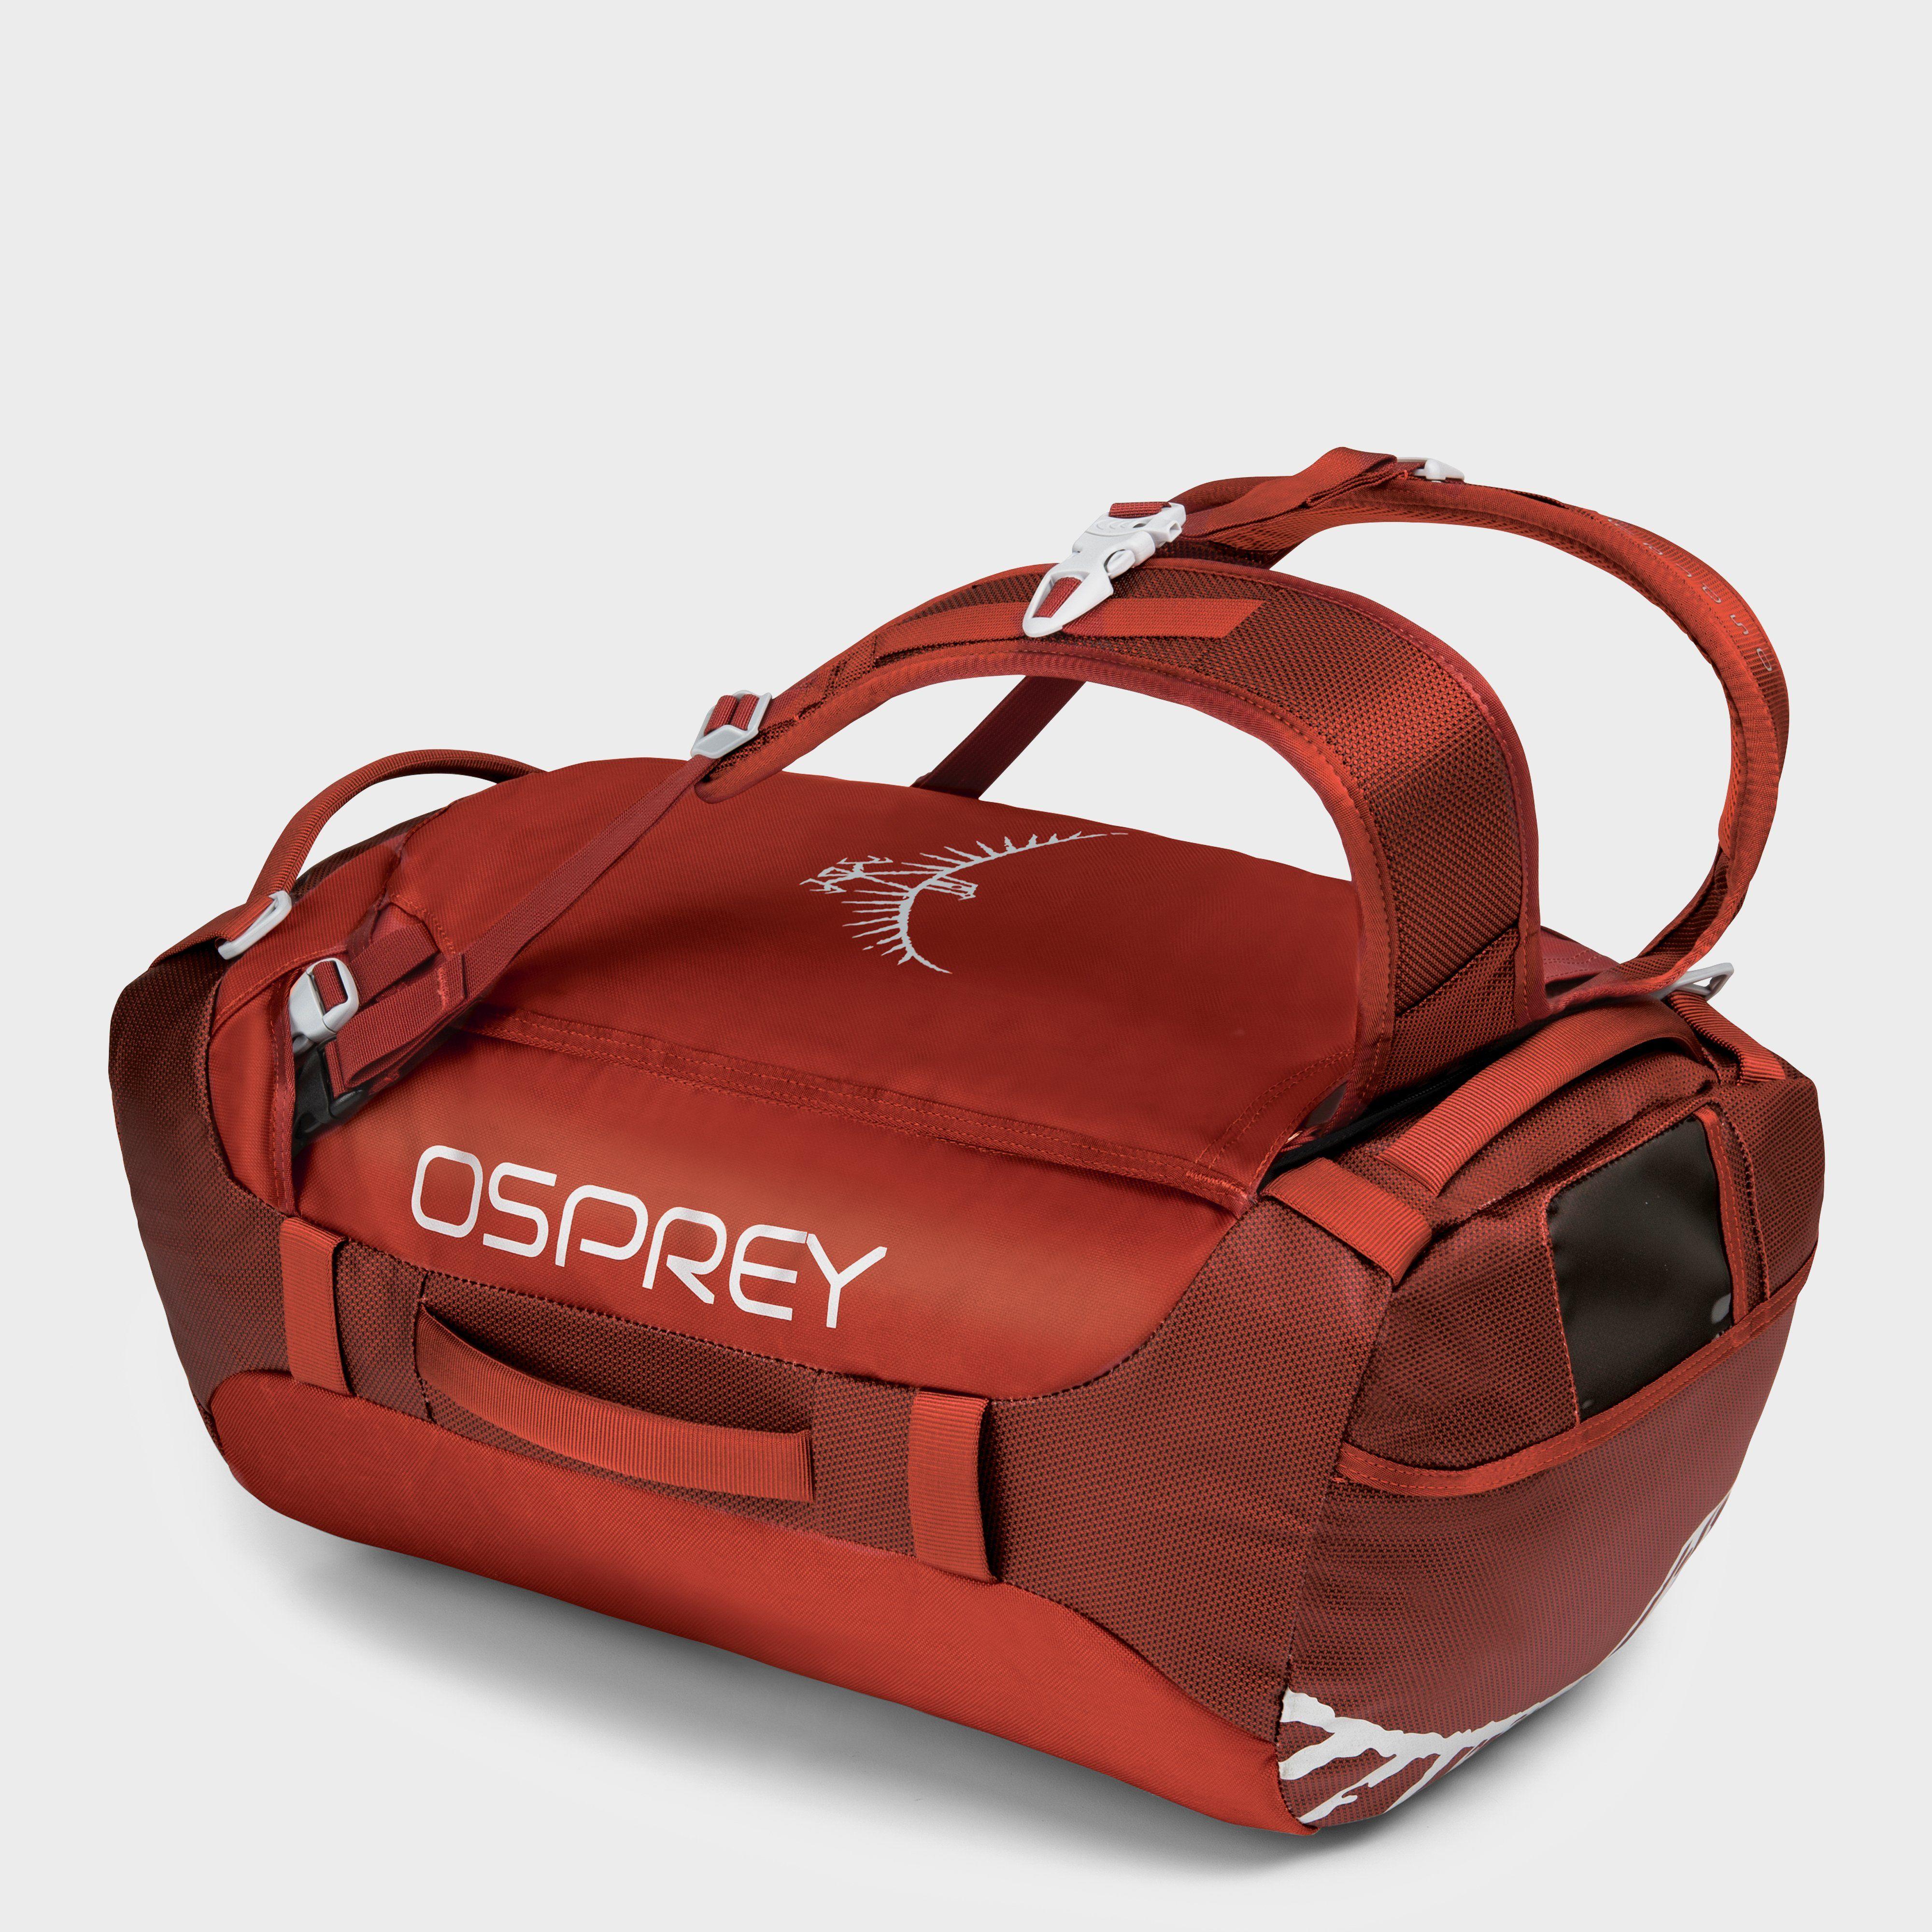 OSPREY Transporter 95L Holdall